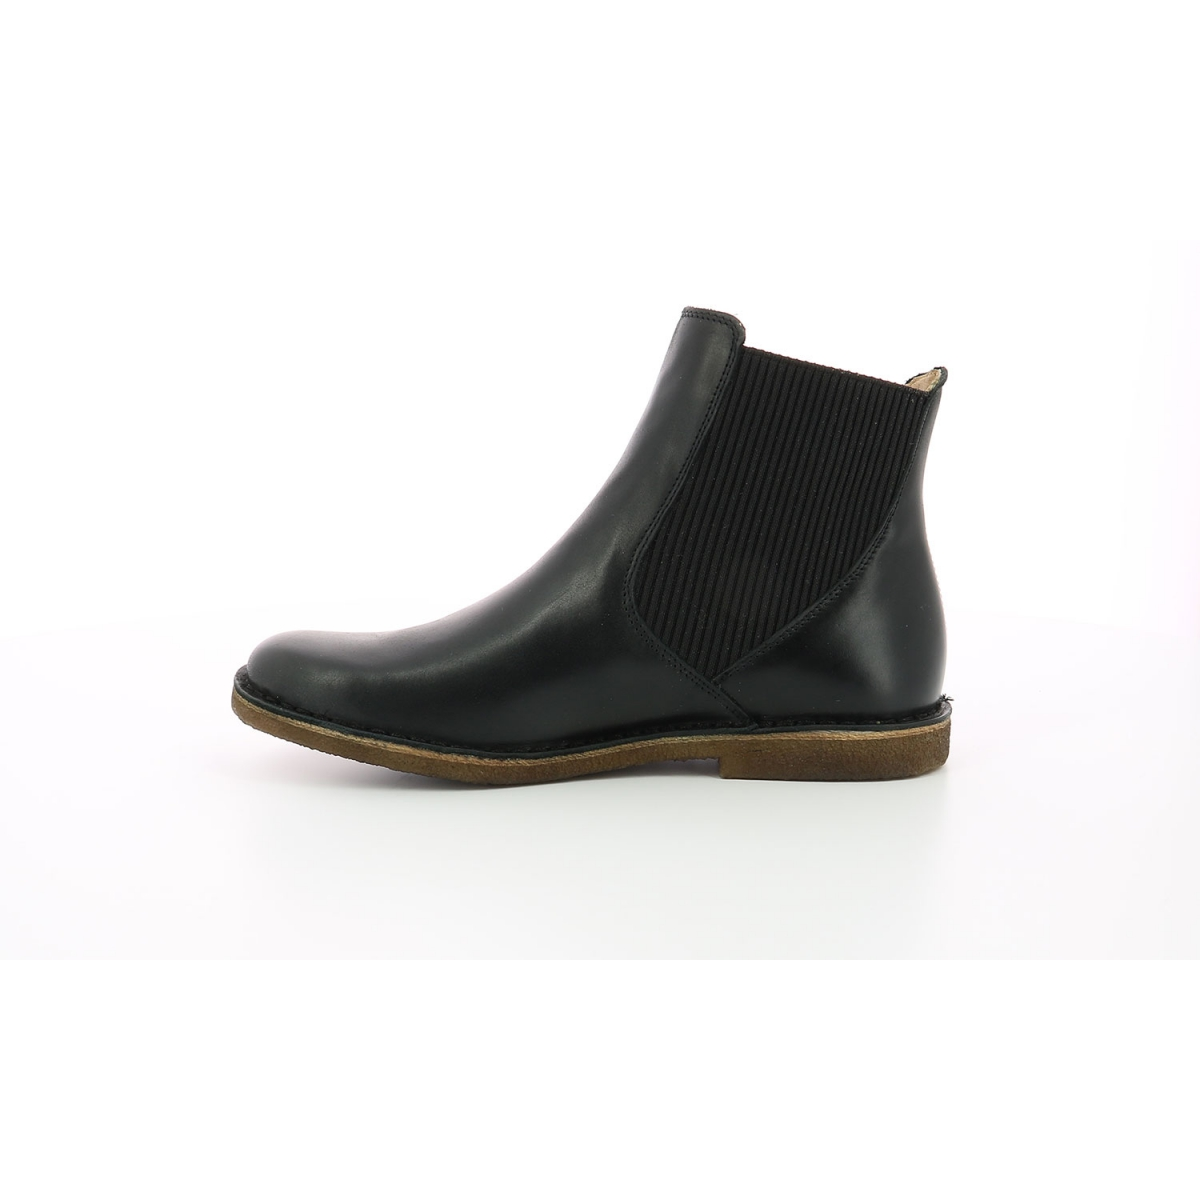 Boots Femme Tinto noir Chaussures Femme Kickers